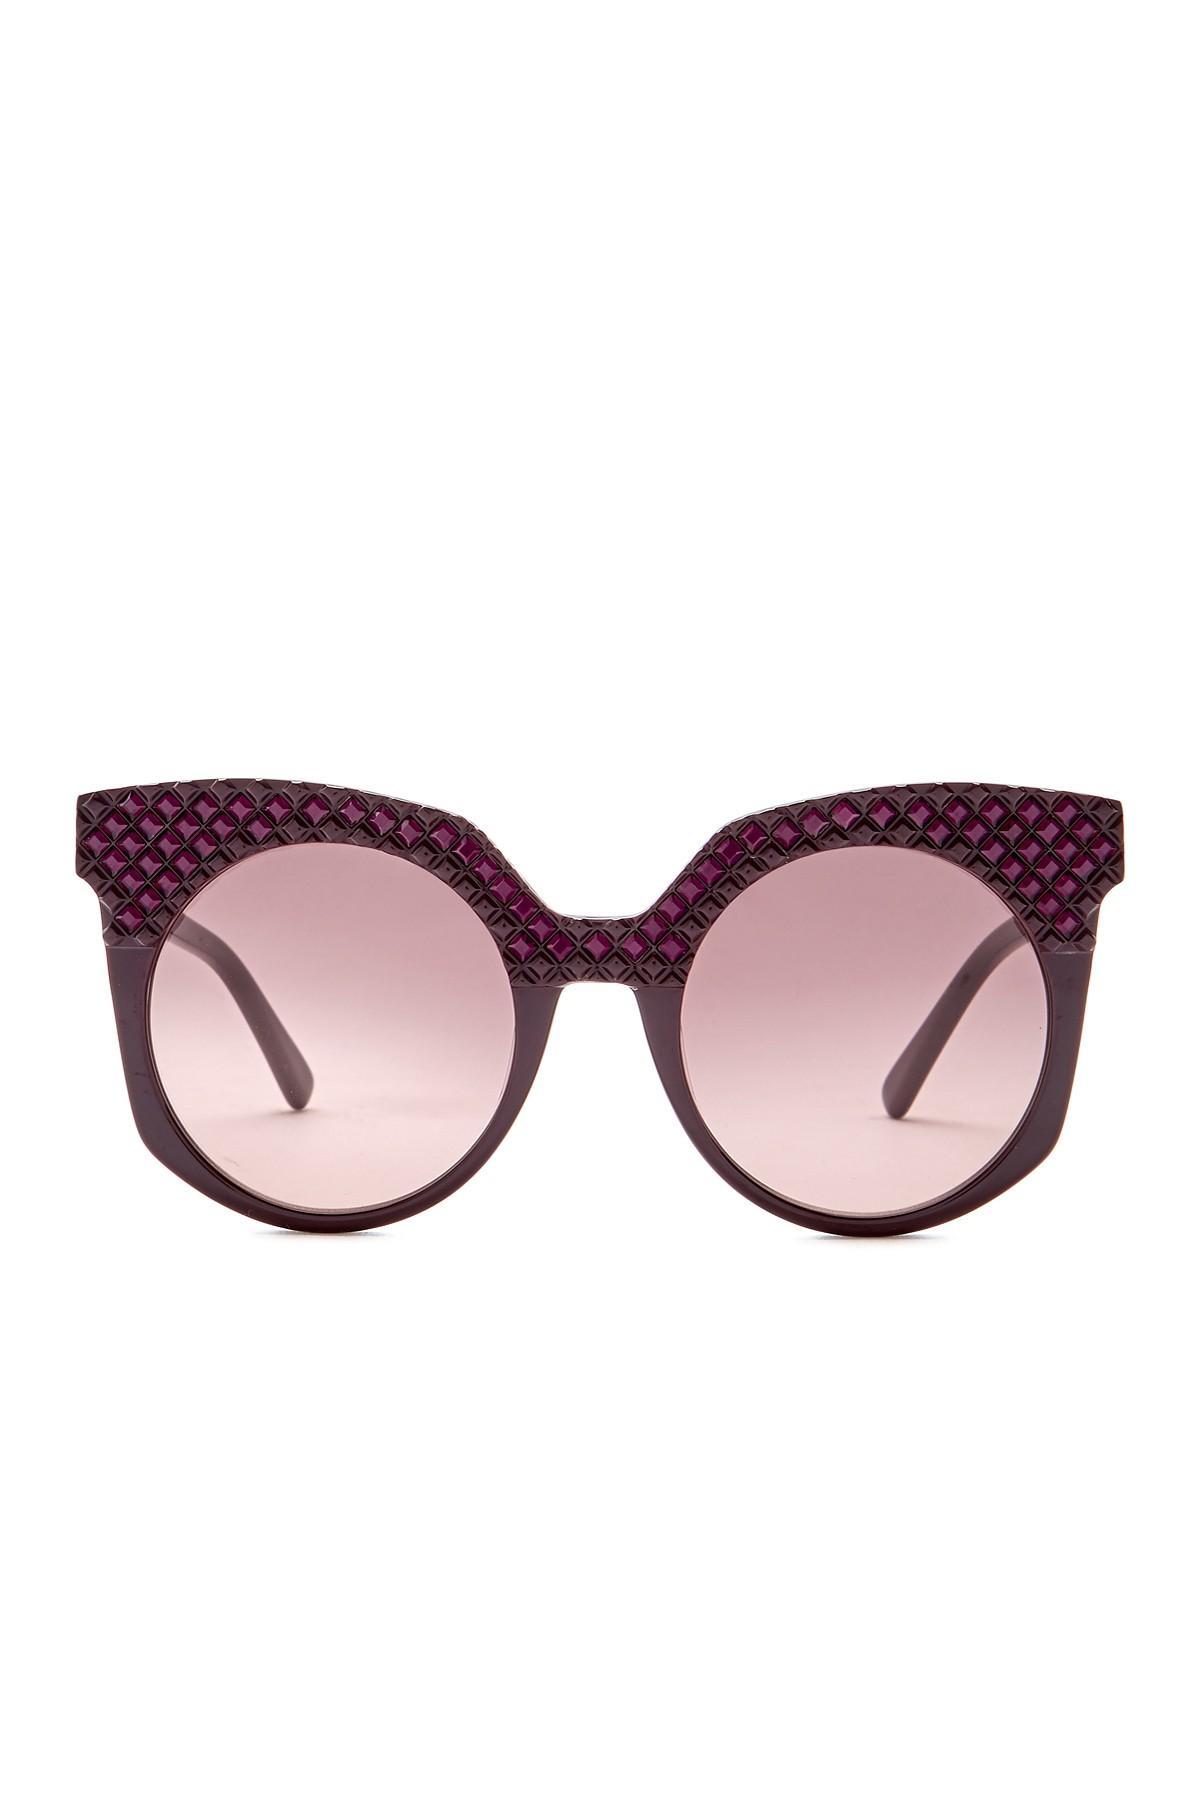 fe7ac402d078f MCM - Purple Women s Cat Eye 52mm Acetate Frame Sunglasses - Lyst. View  fullscreen